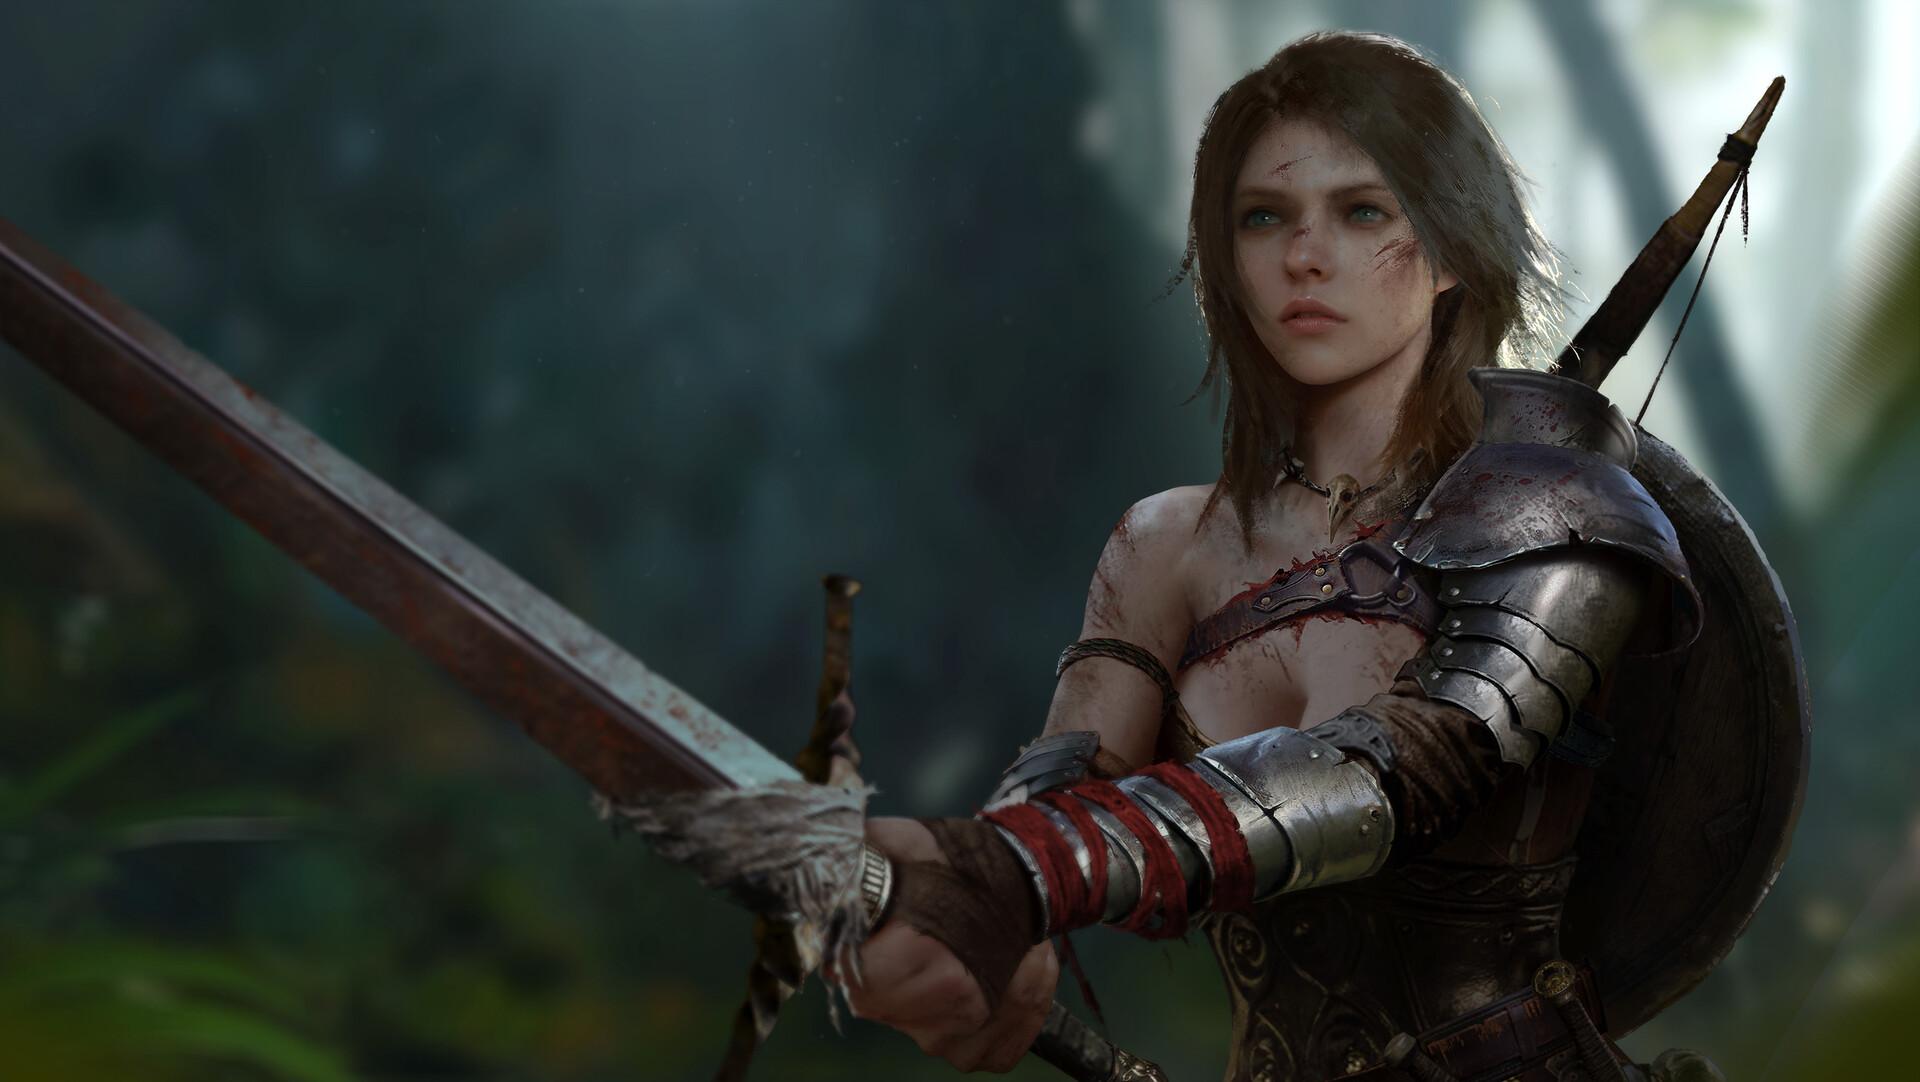 General 1920x1082 artwork digital art women sword armor bow forest fantasy art shoulder length hair Jun Rao